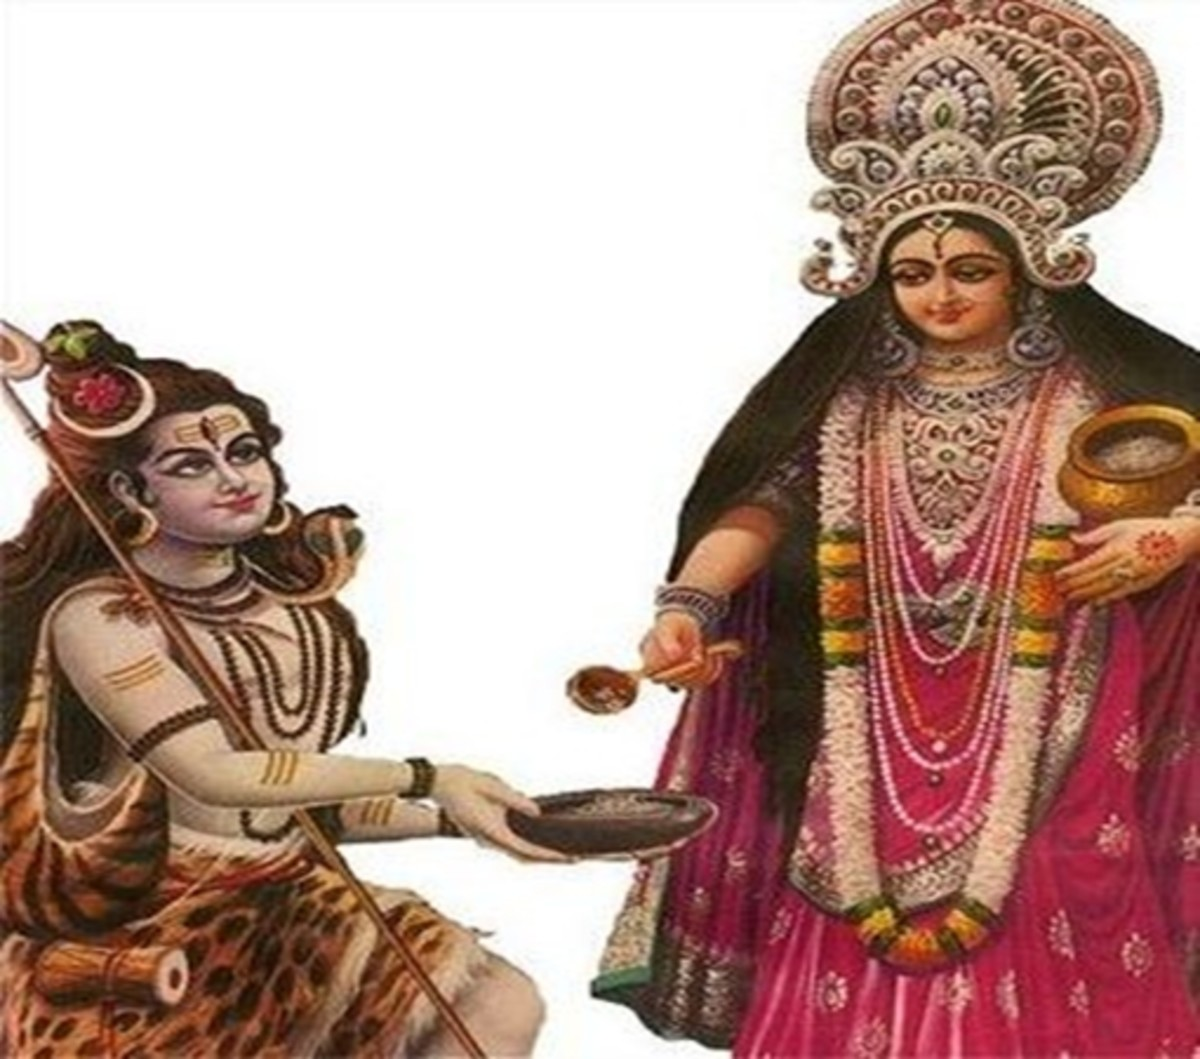 Goddess Annapurna with consort Lord Shiva